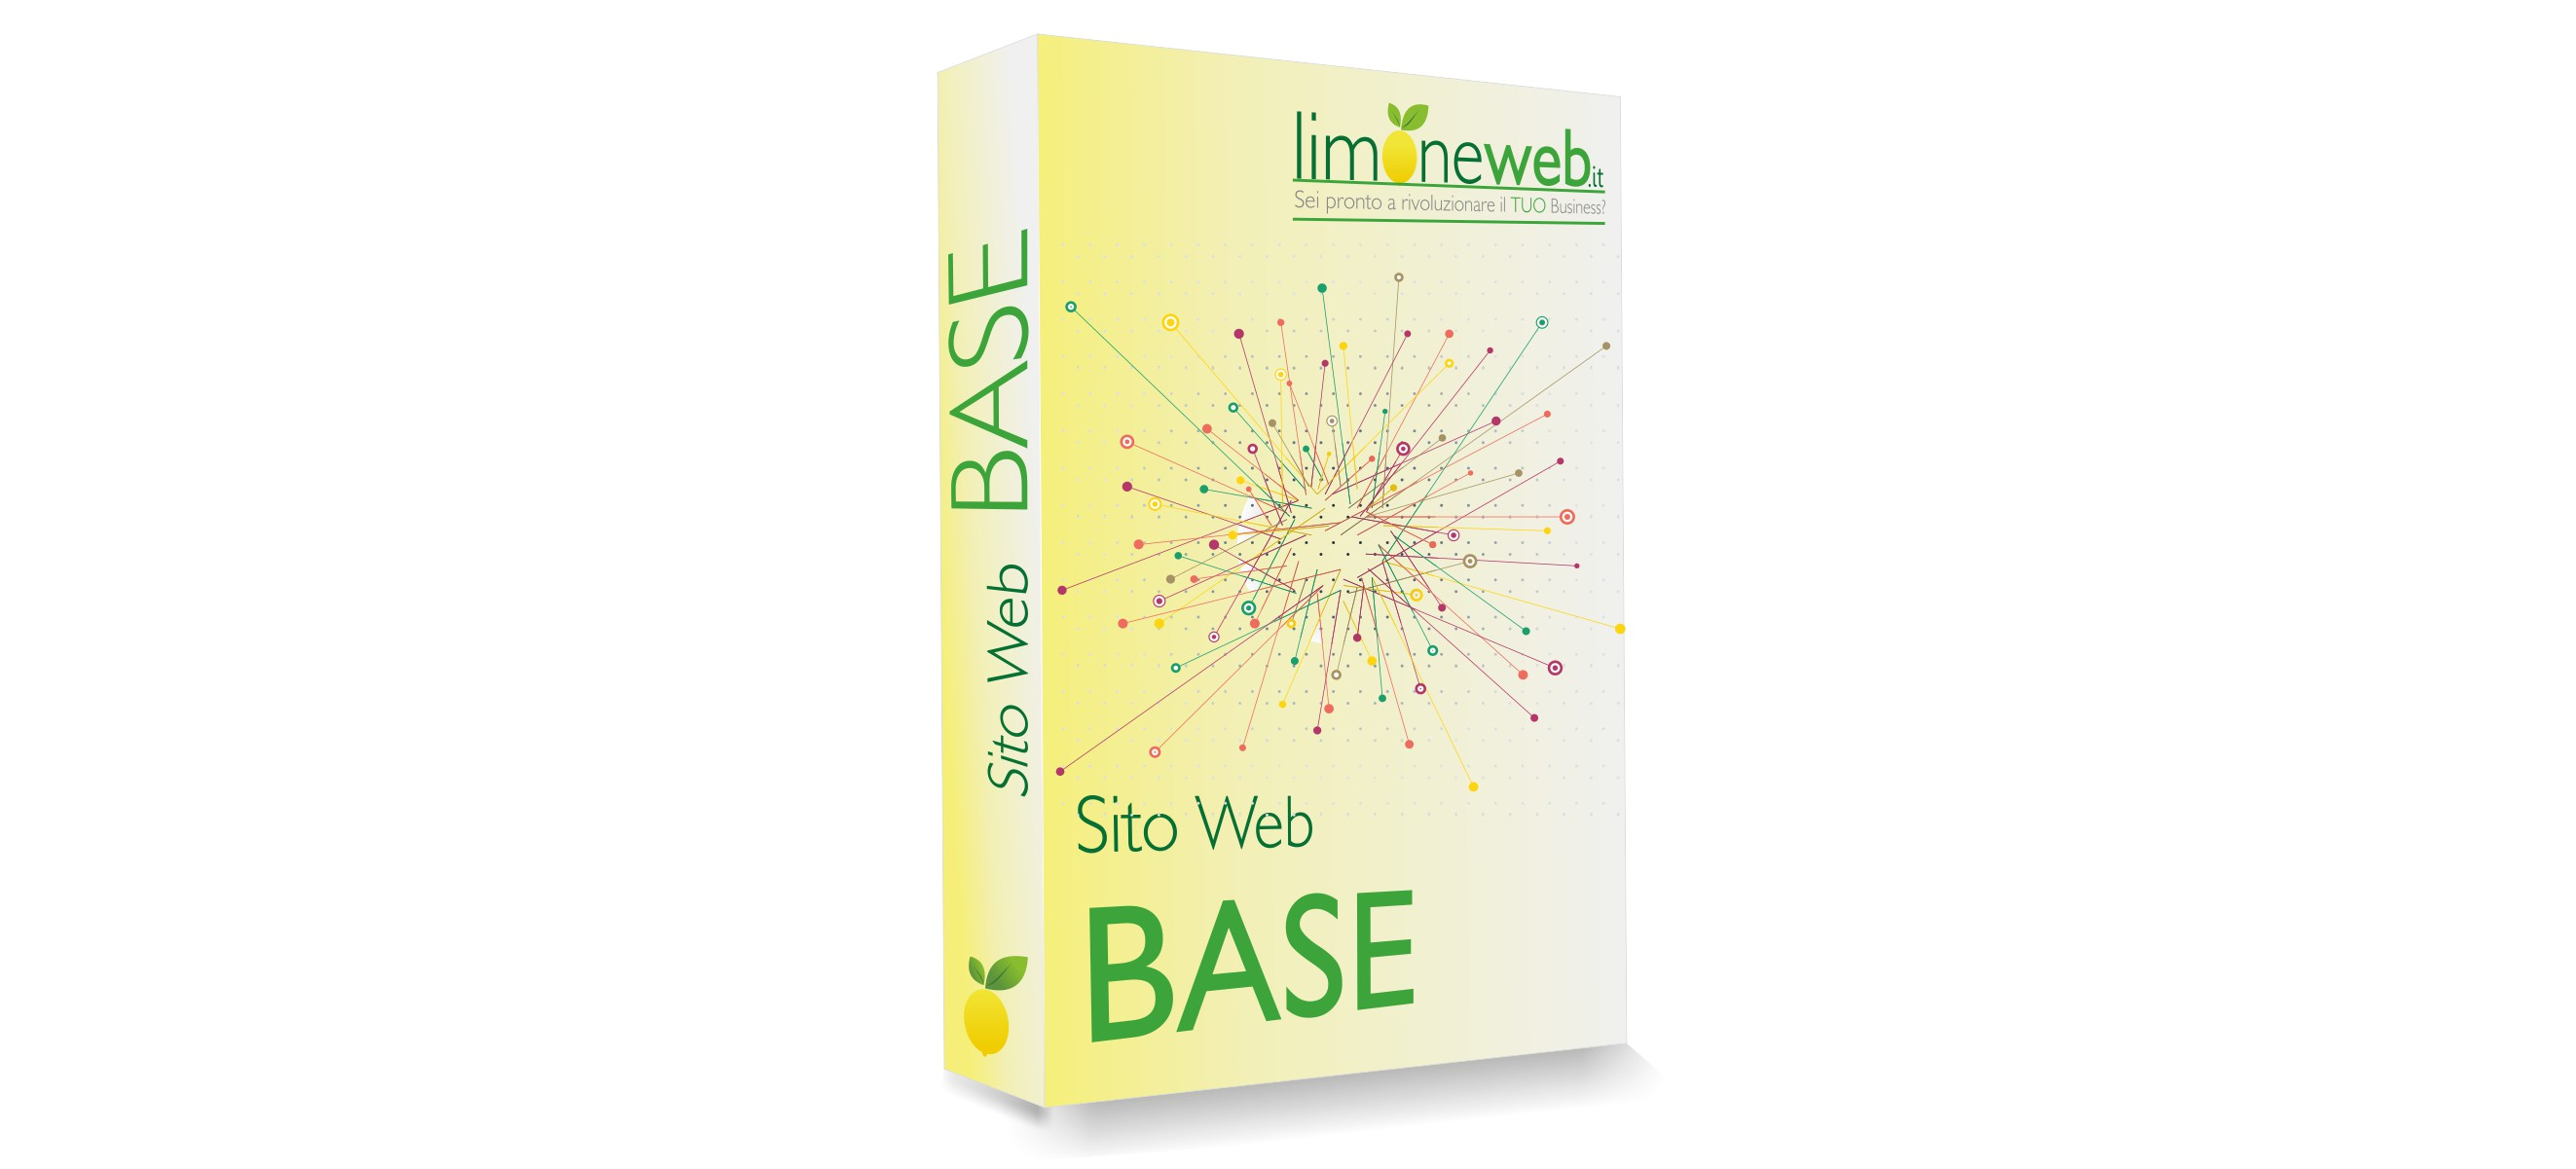 LimoneWeb.it - Sito Web Base